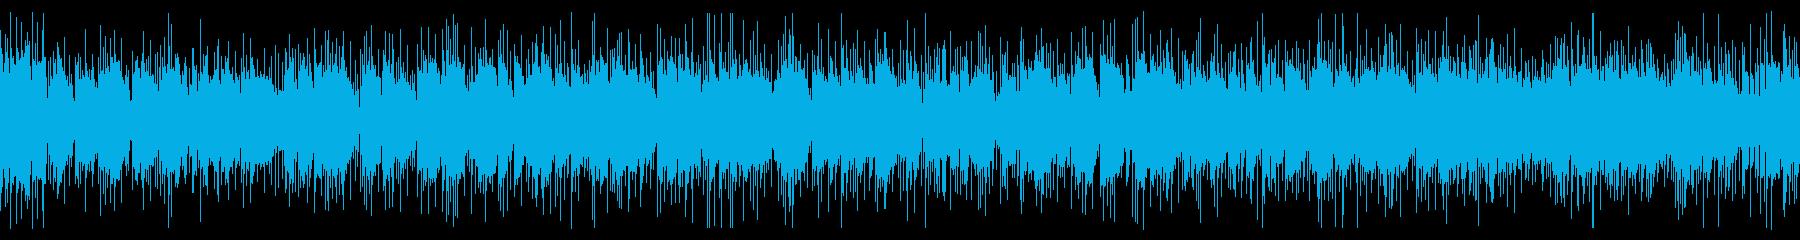 "Chopin ""Revolution"" Guitar ver.'s reproduced waveform"